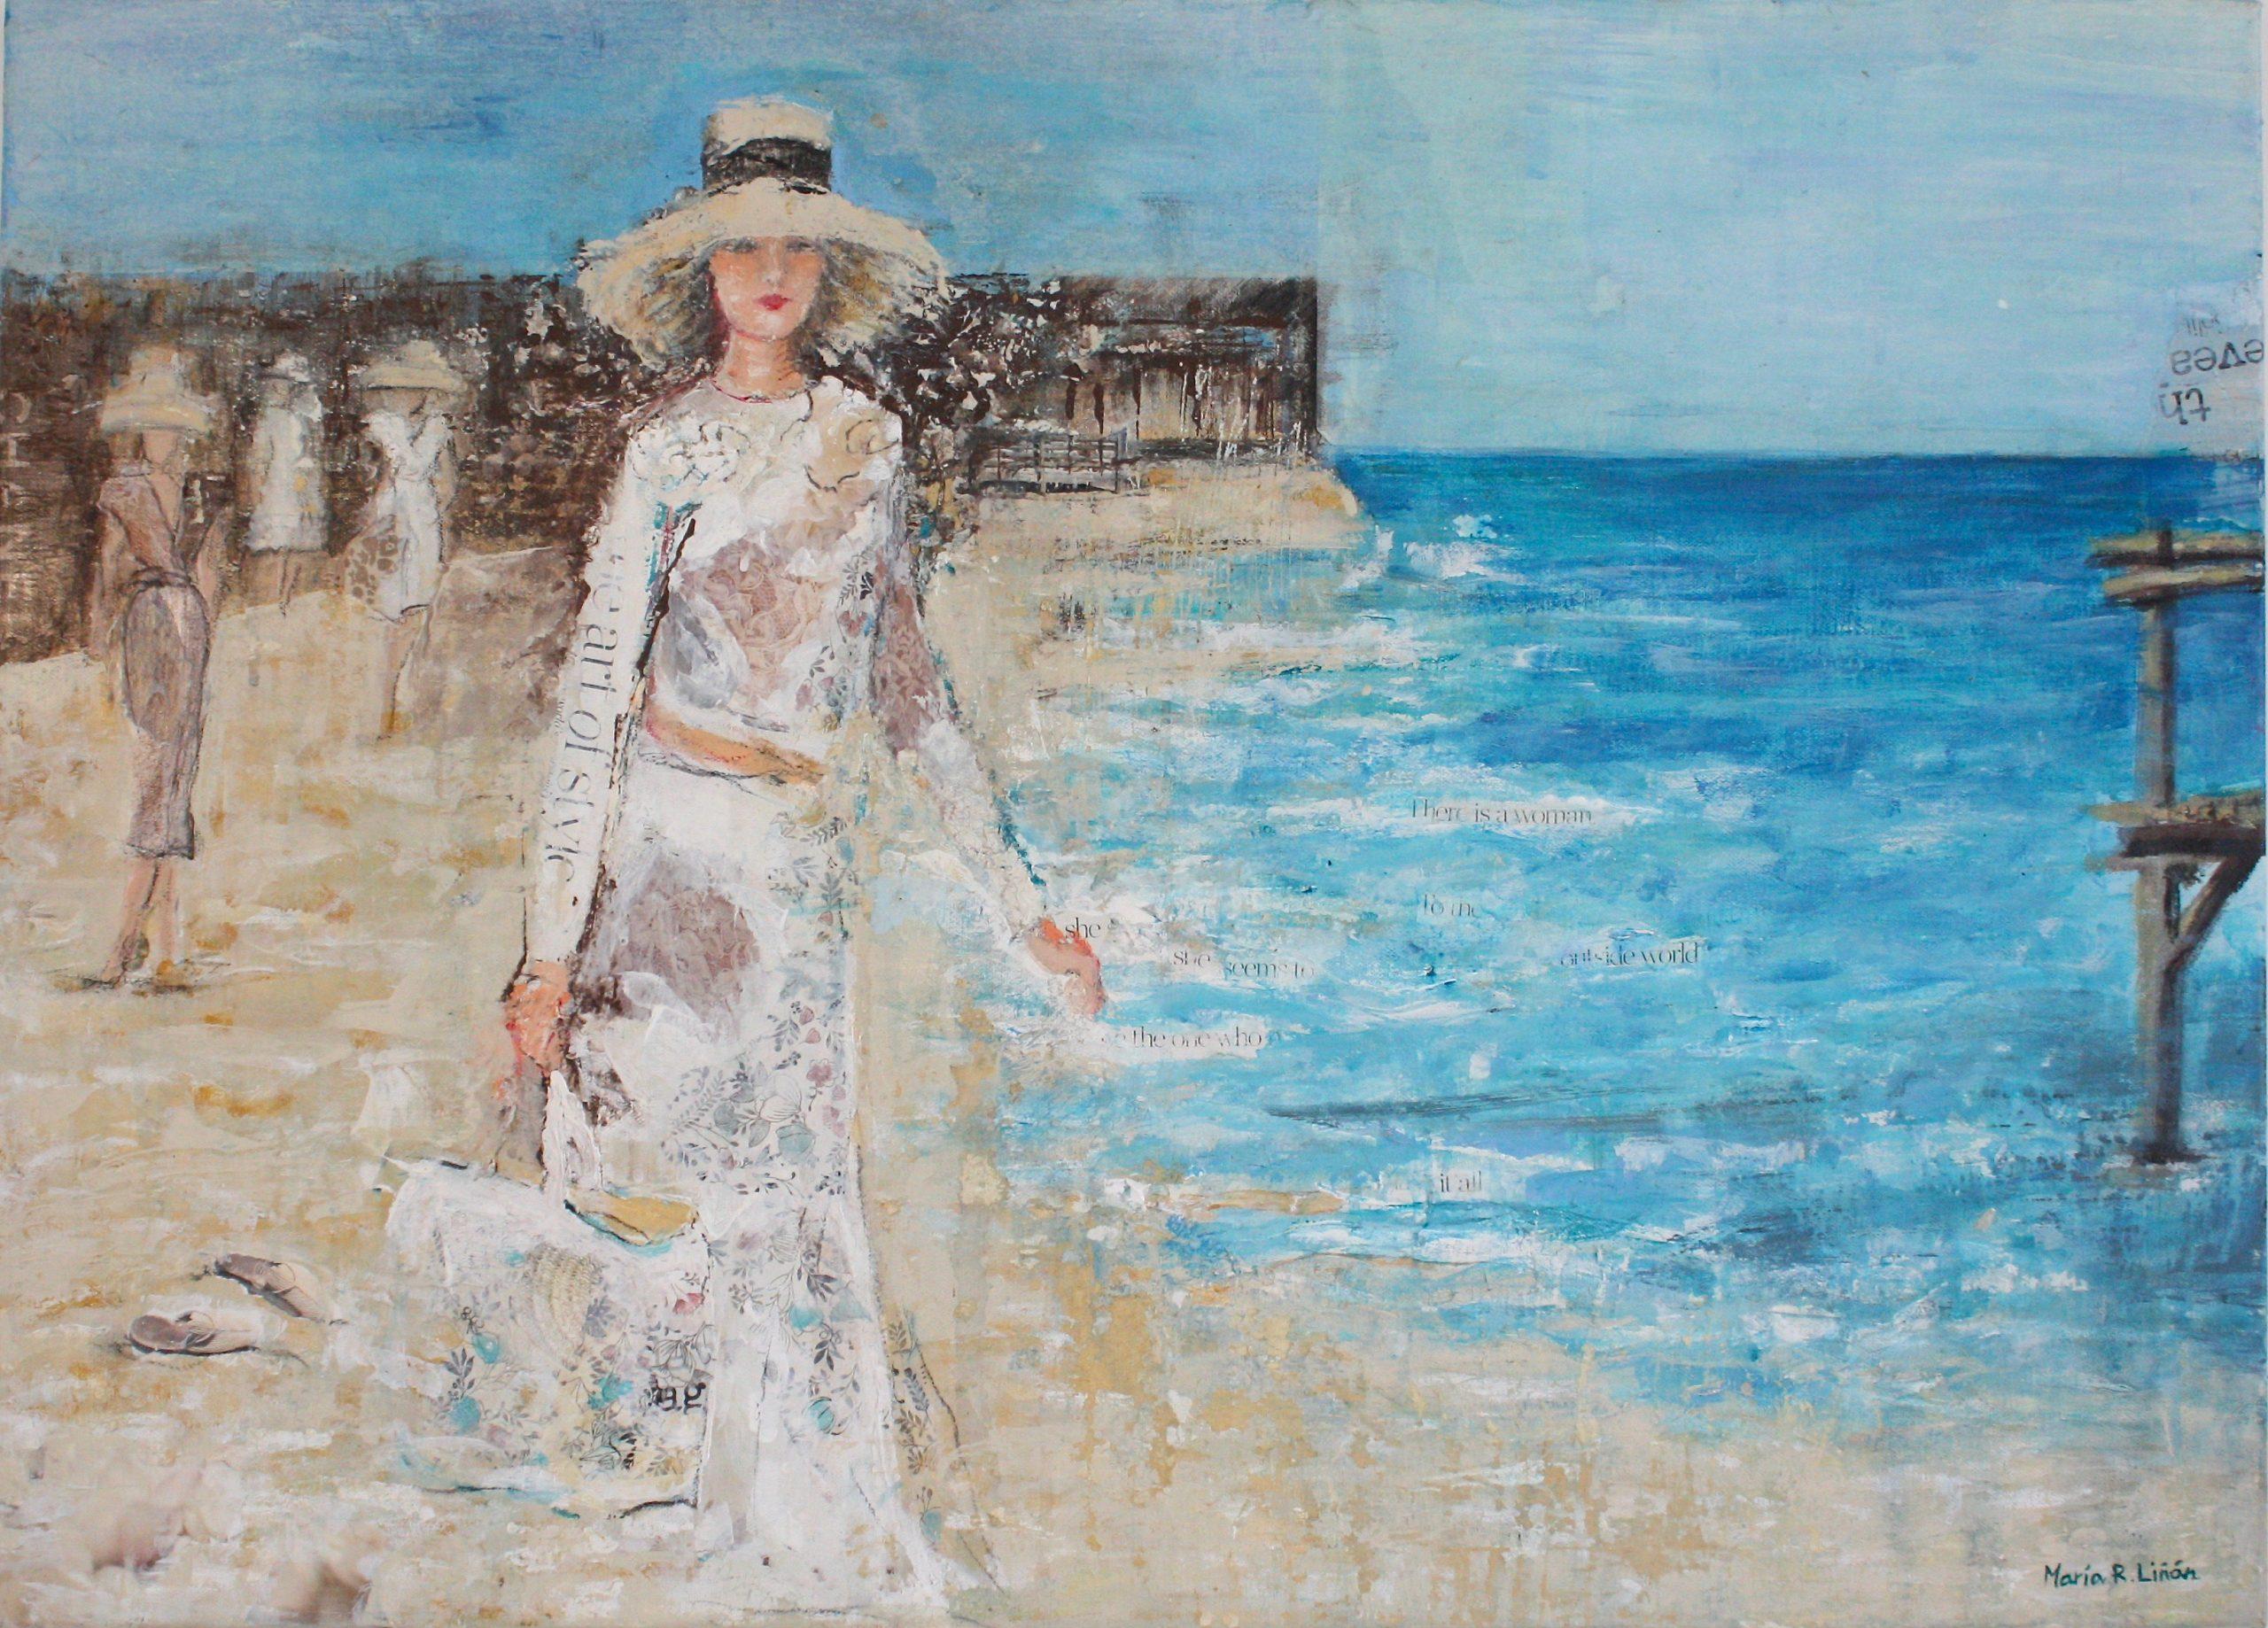 Maria Etrala Chanel Playa